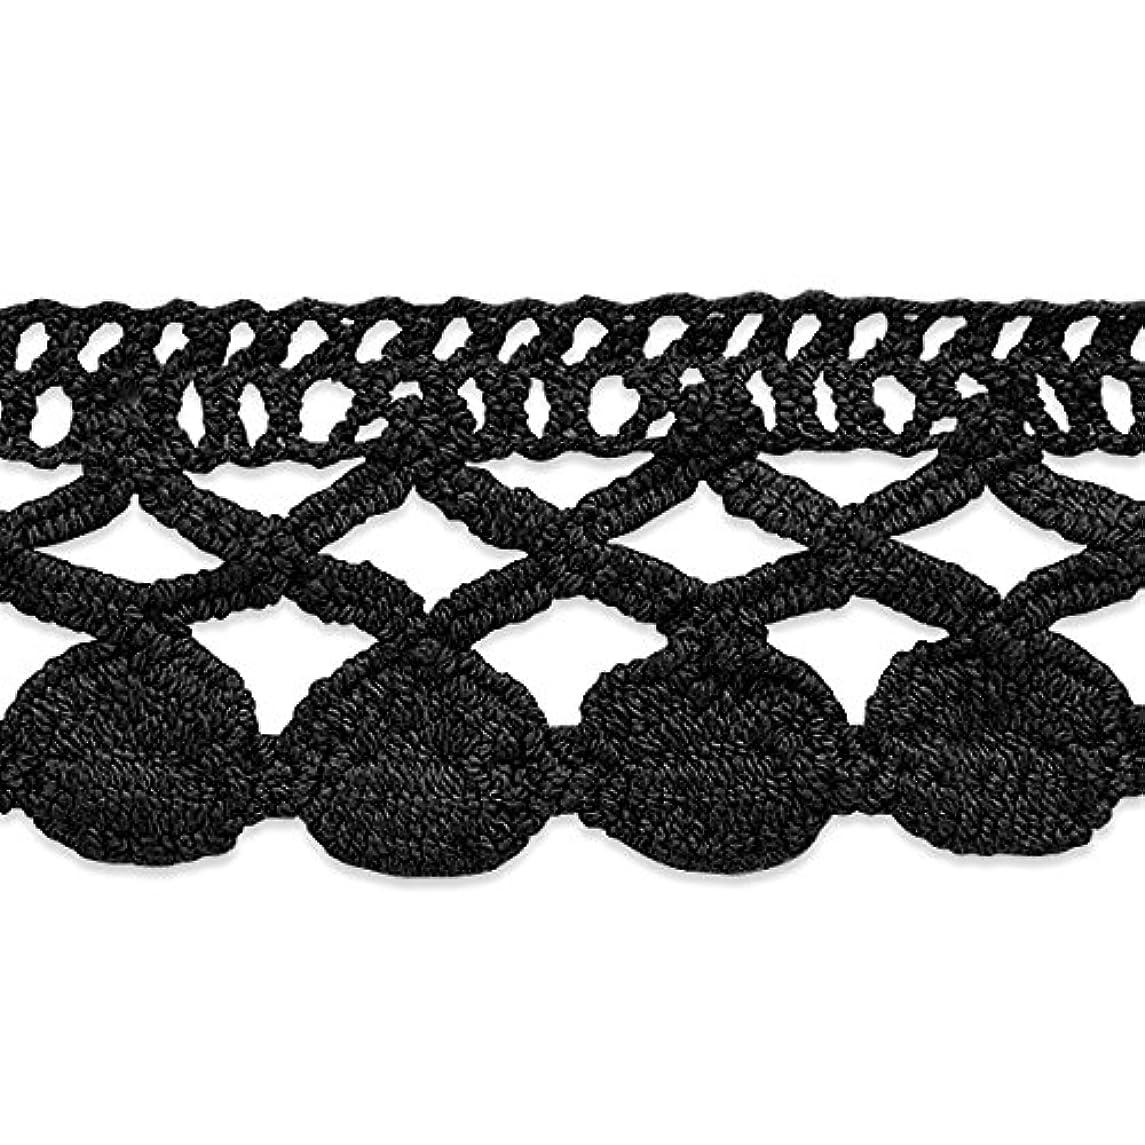 Expo International Sadie Machine Crocheted Trim Embellishment, 10-Yard, Black